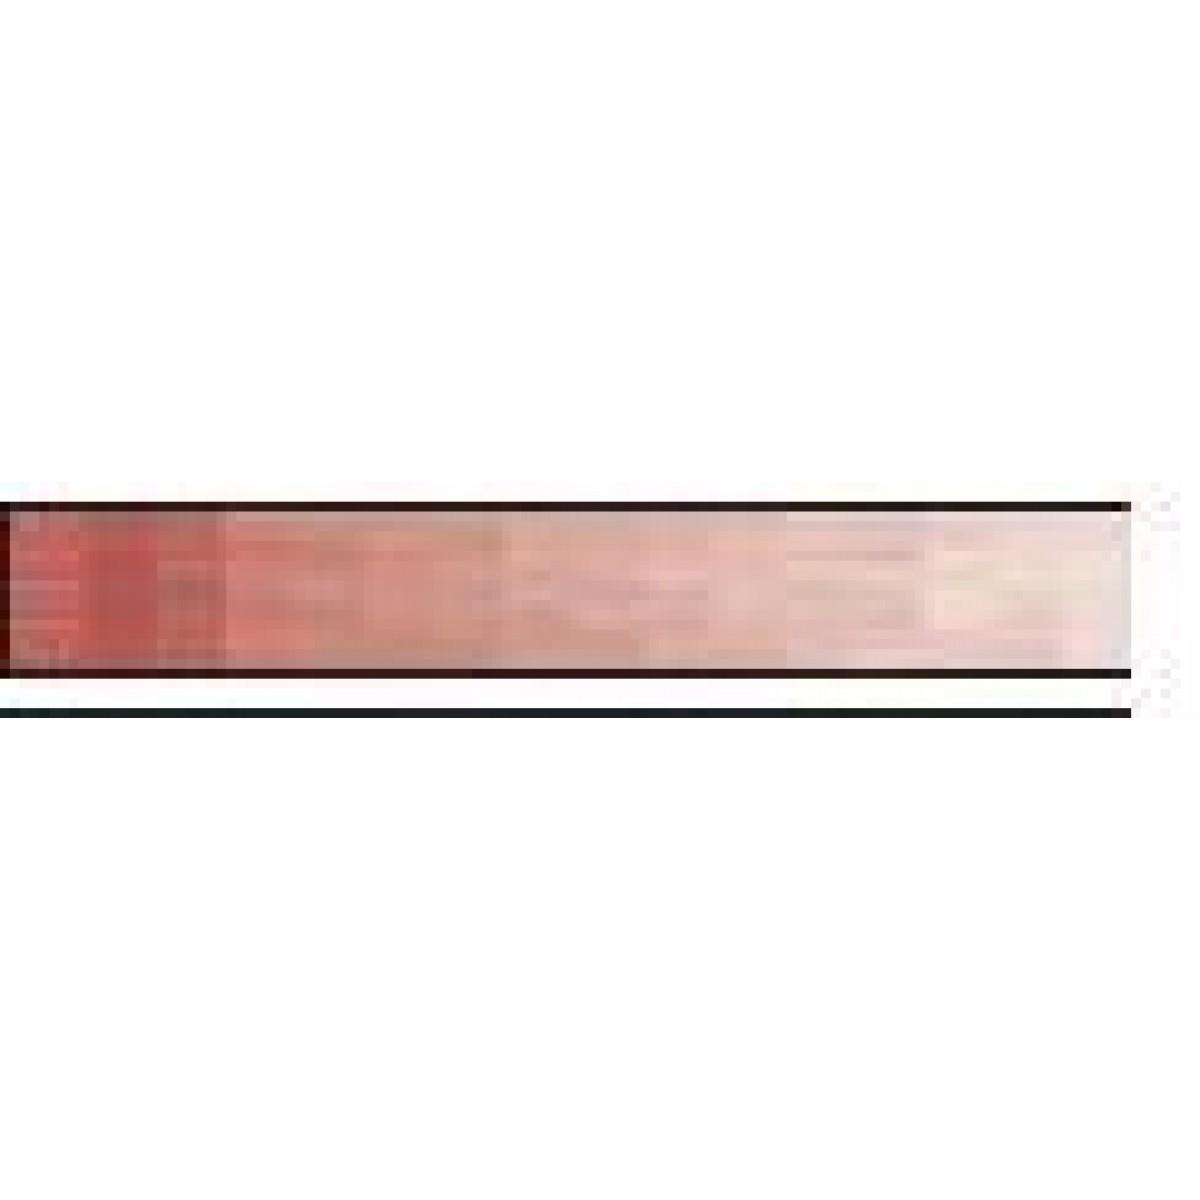 85112 Kunstnerkvalitet soft pastel English red dark